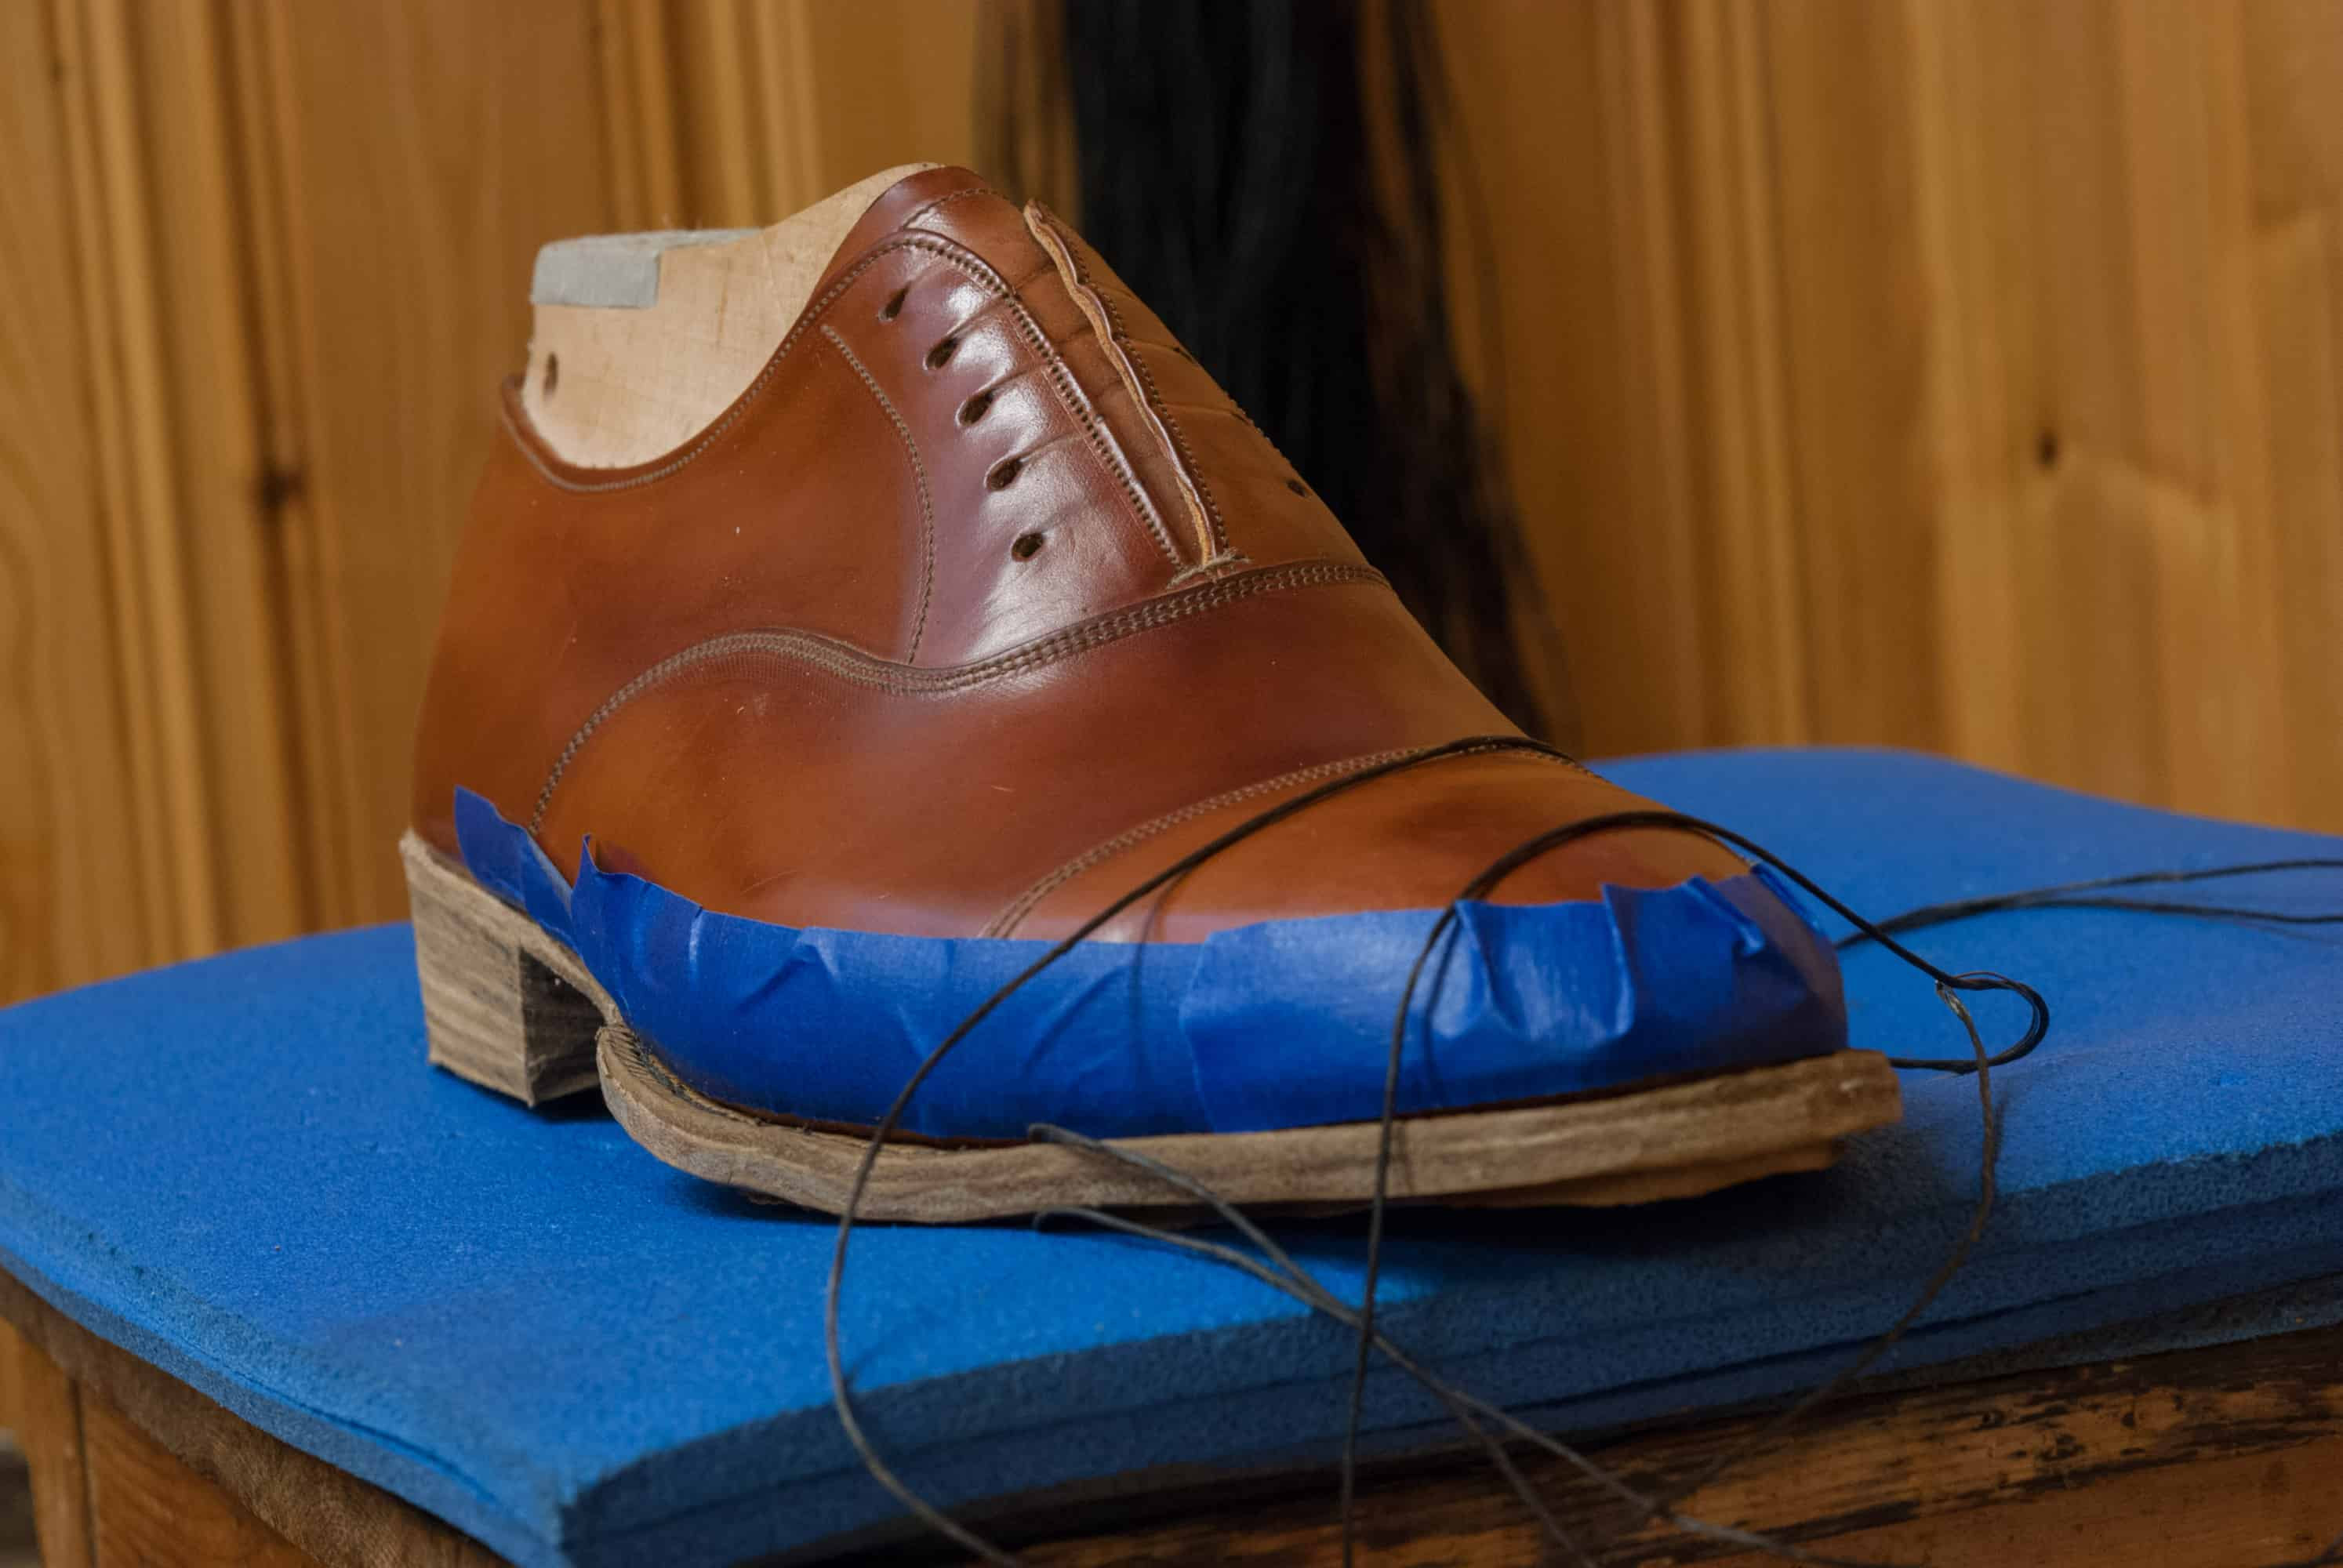 Reportage – Kurs i skotillverkning, del 2 – Shoegazing